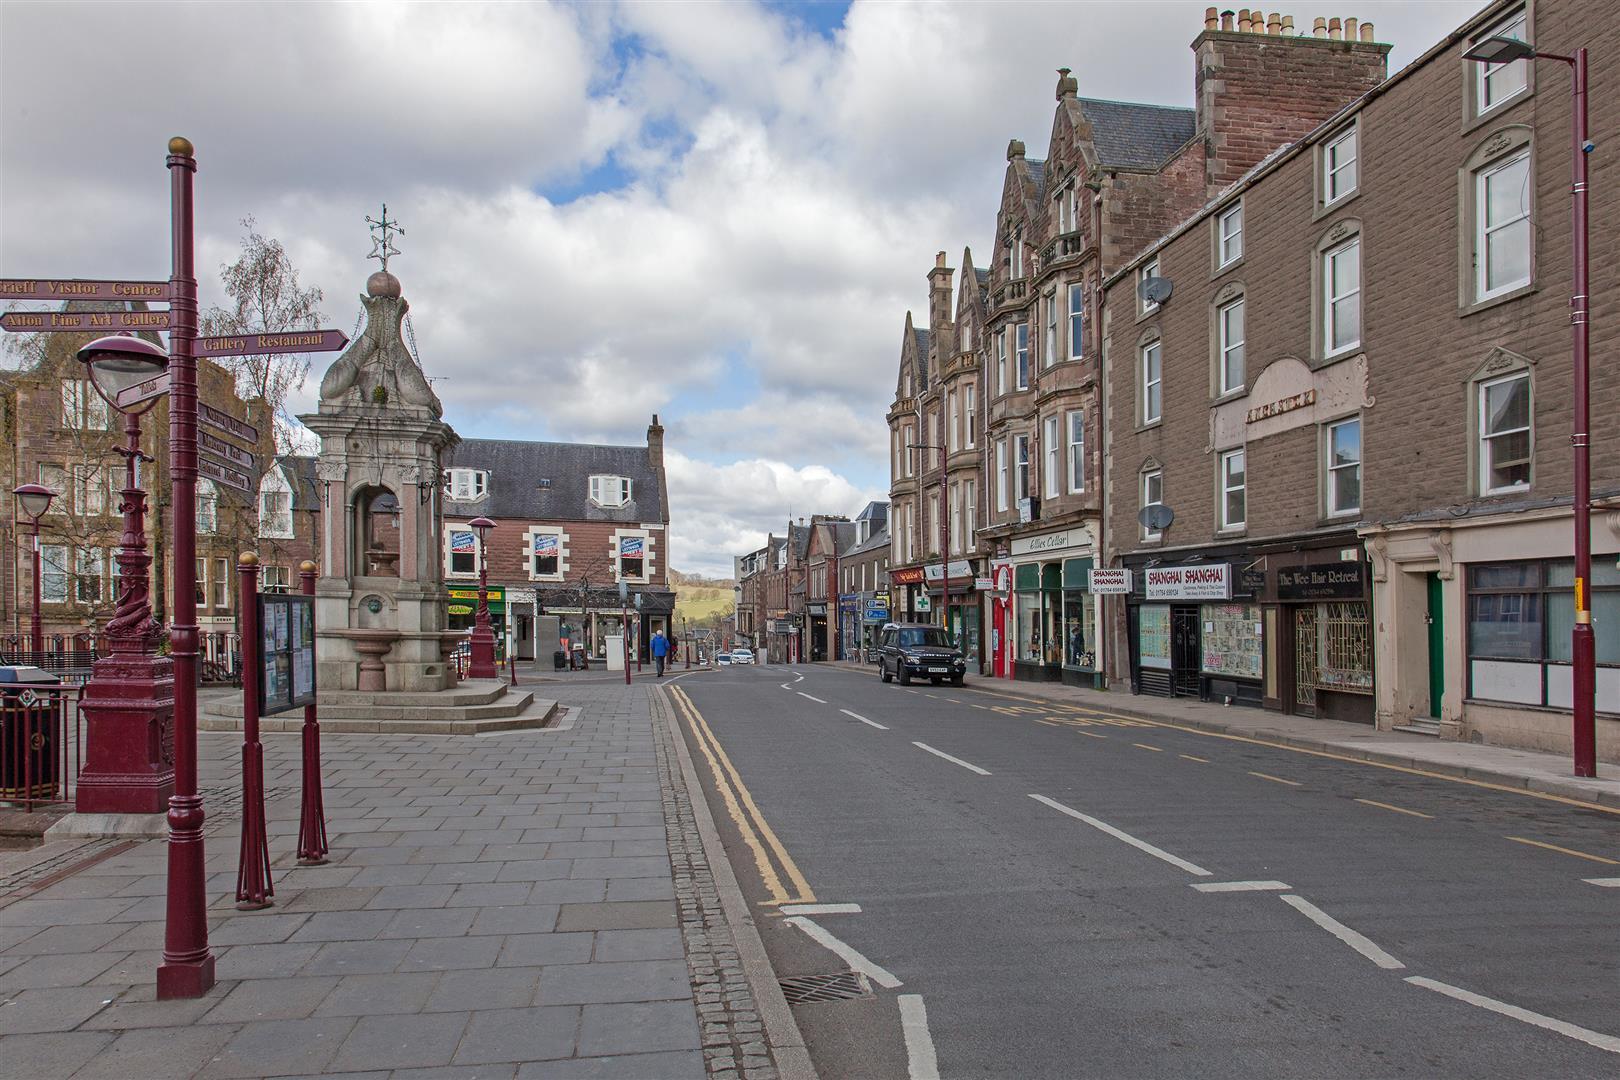 1A, Alma Place, Crieff, Perthshire, PH7 3JG, UK